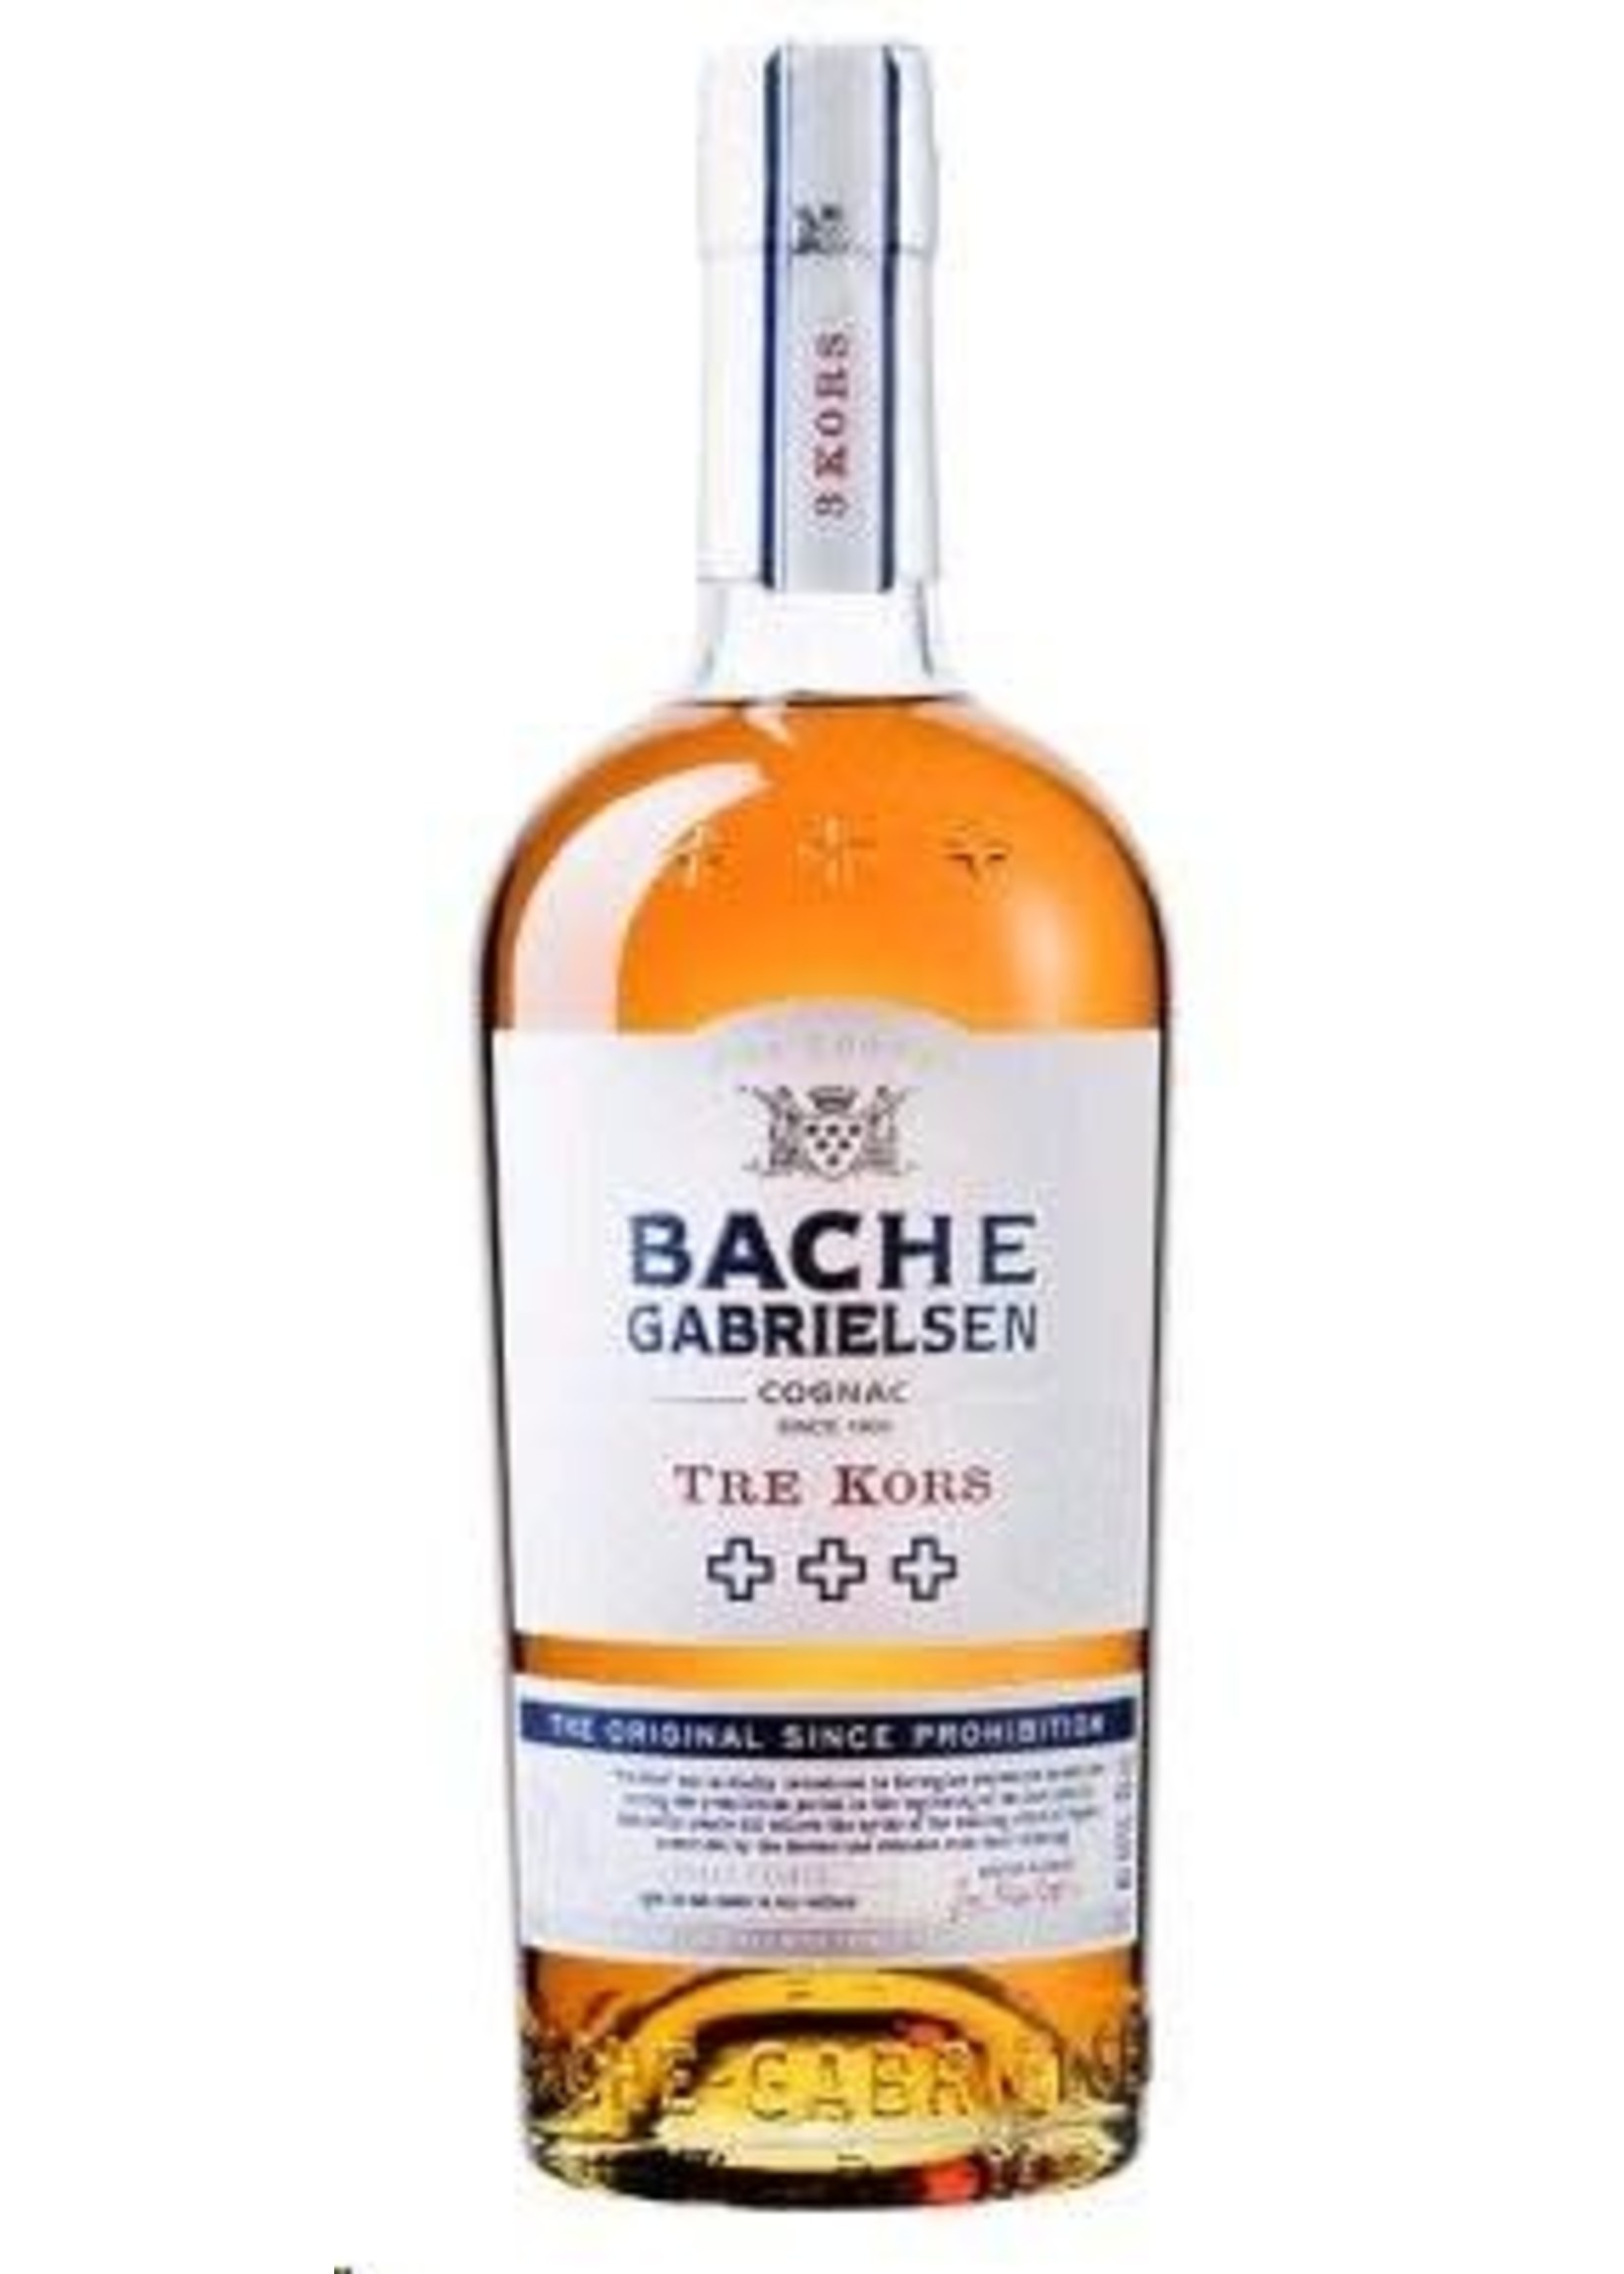 Bache Gabrielsen Bache Gabrielsen / Tre Kors Fine Cognac / 750mL